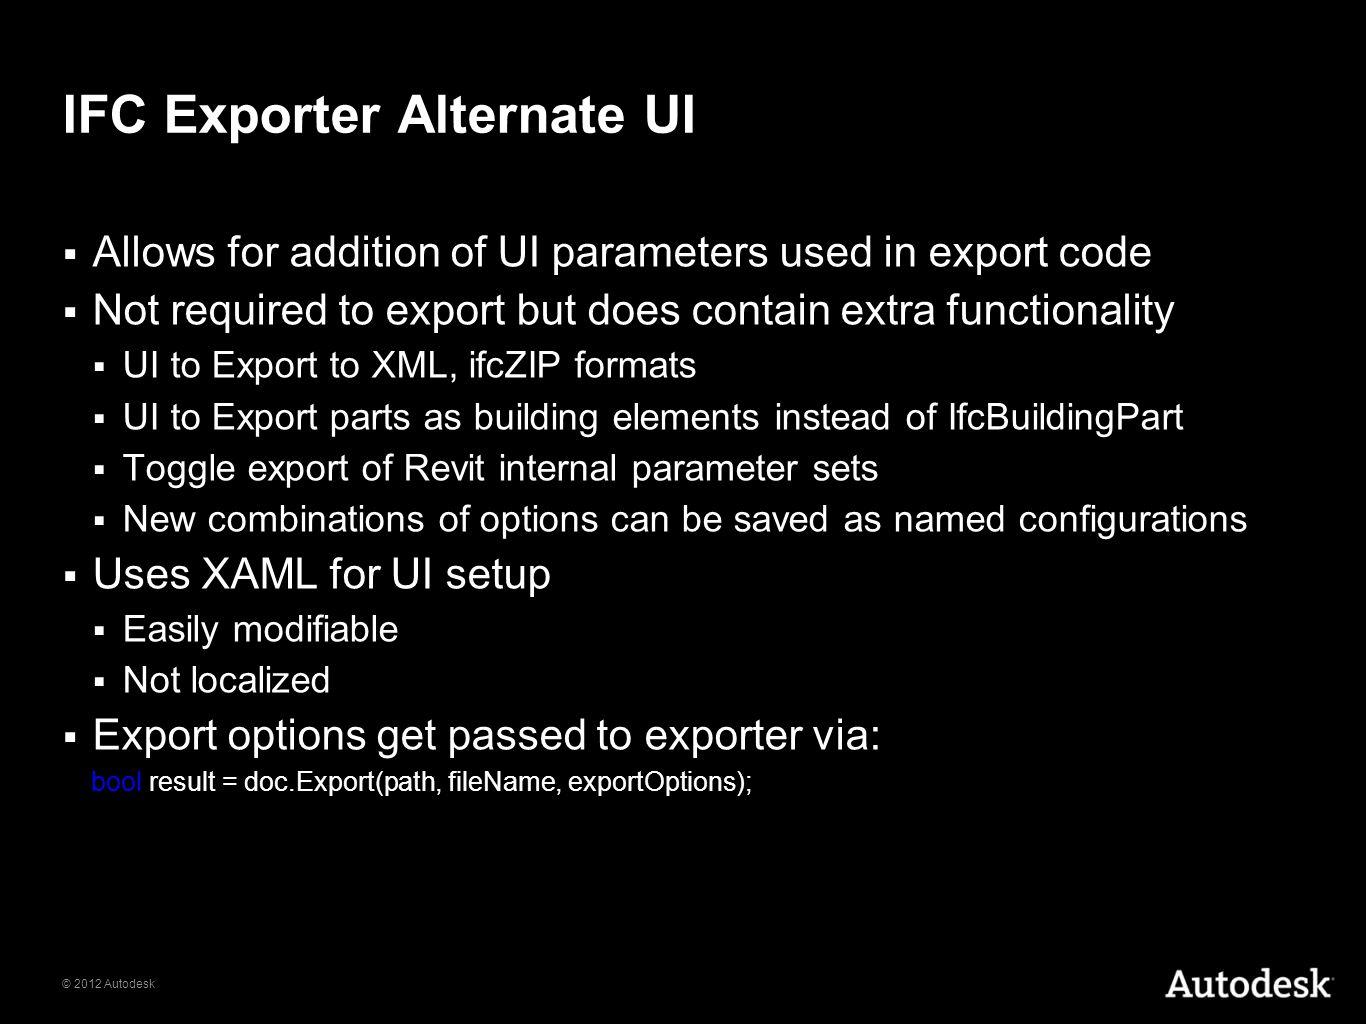 IFC Exporter Alternate UI